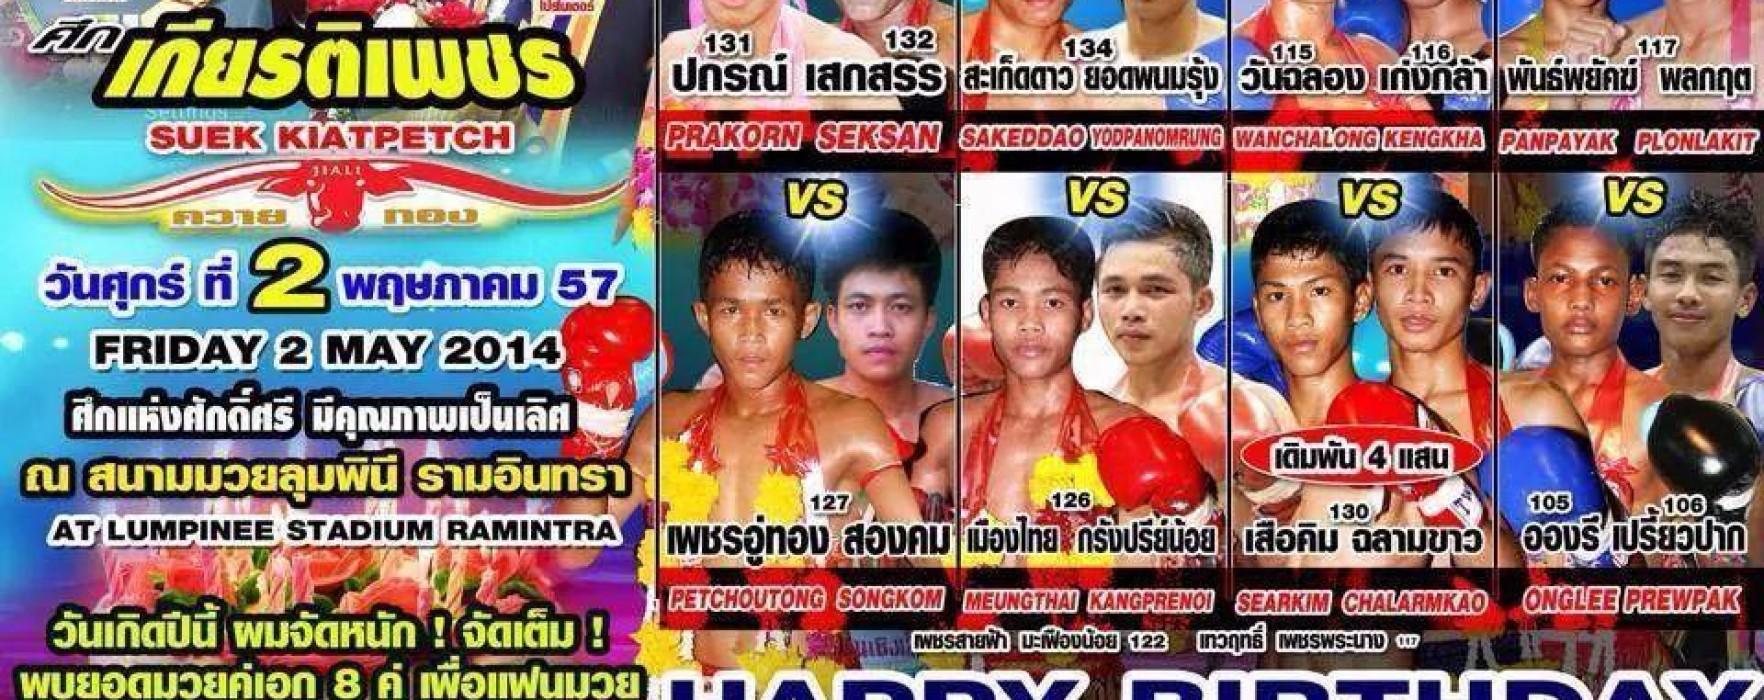 Pakorn vince ai punti vs Saeksan – Risultati match nuovo Lumpinee 2 Maggio 2014